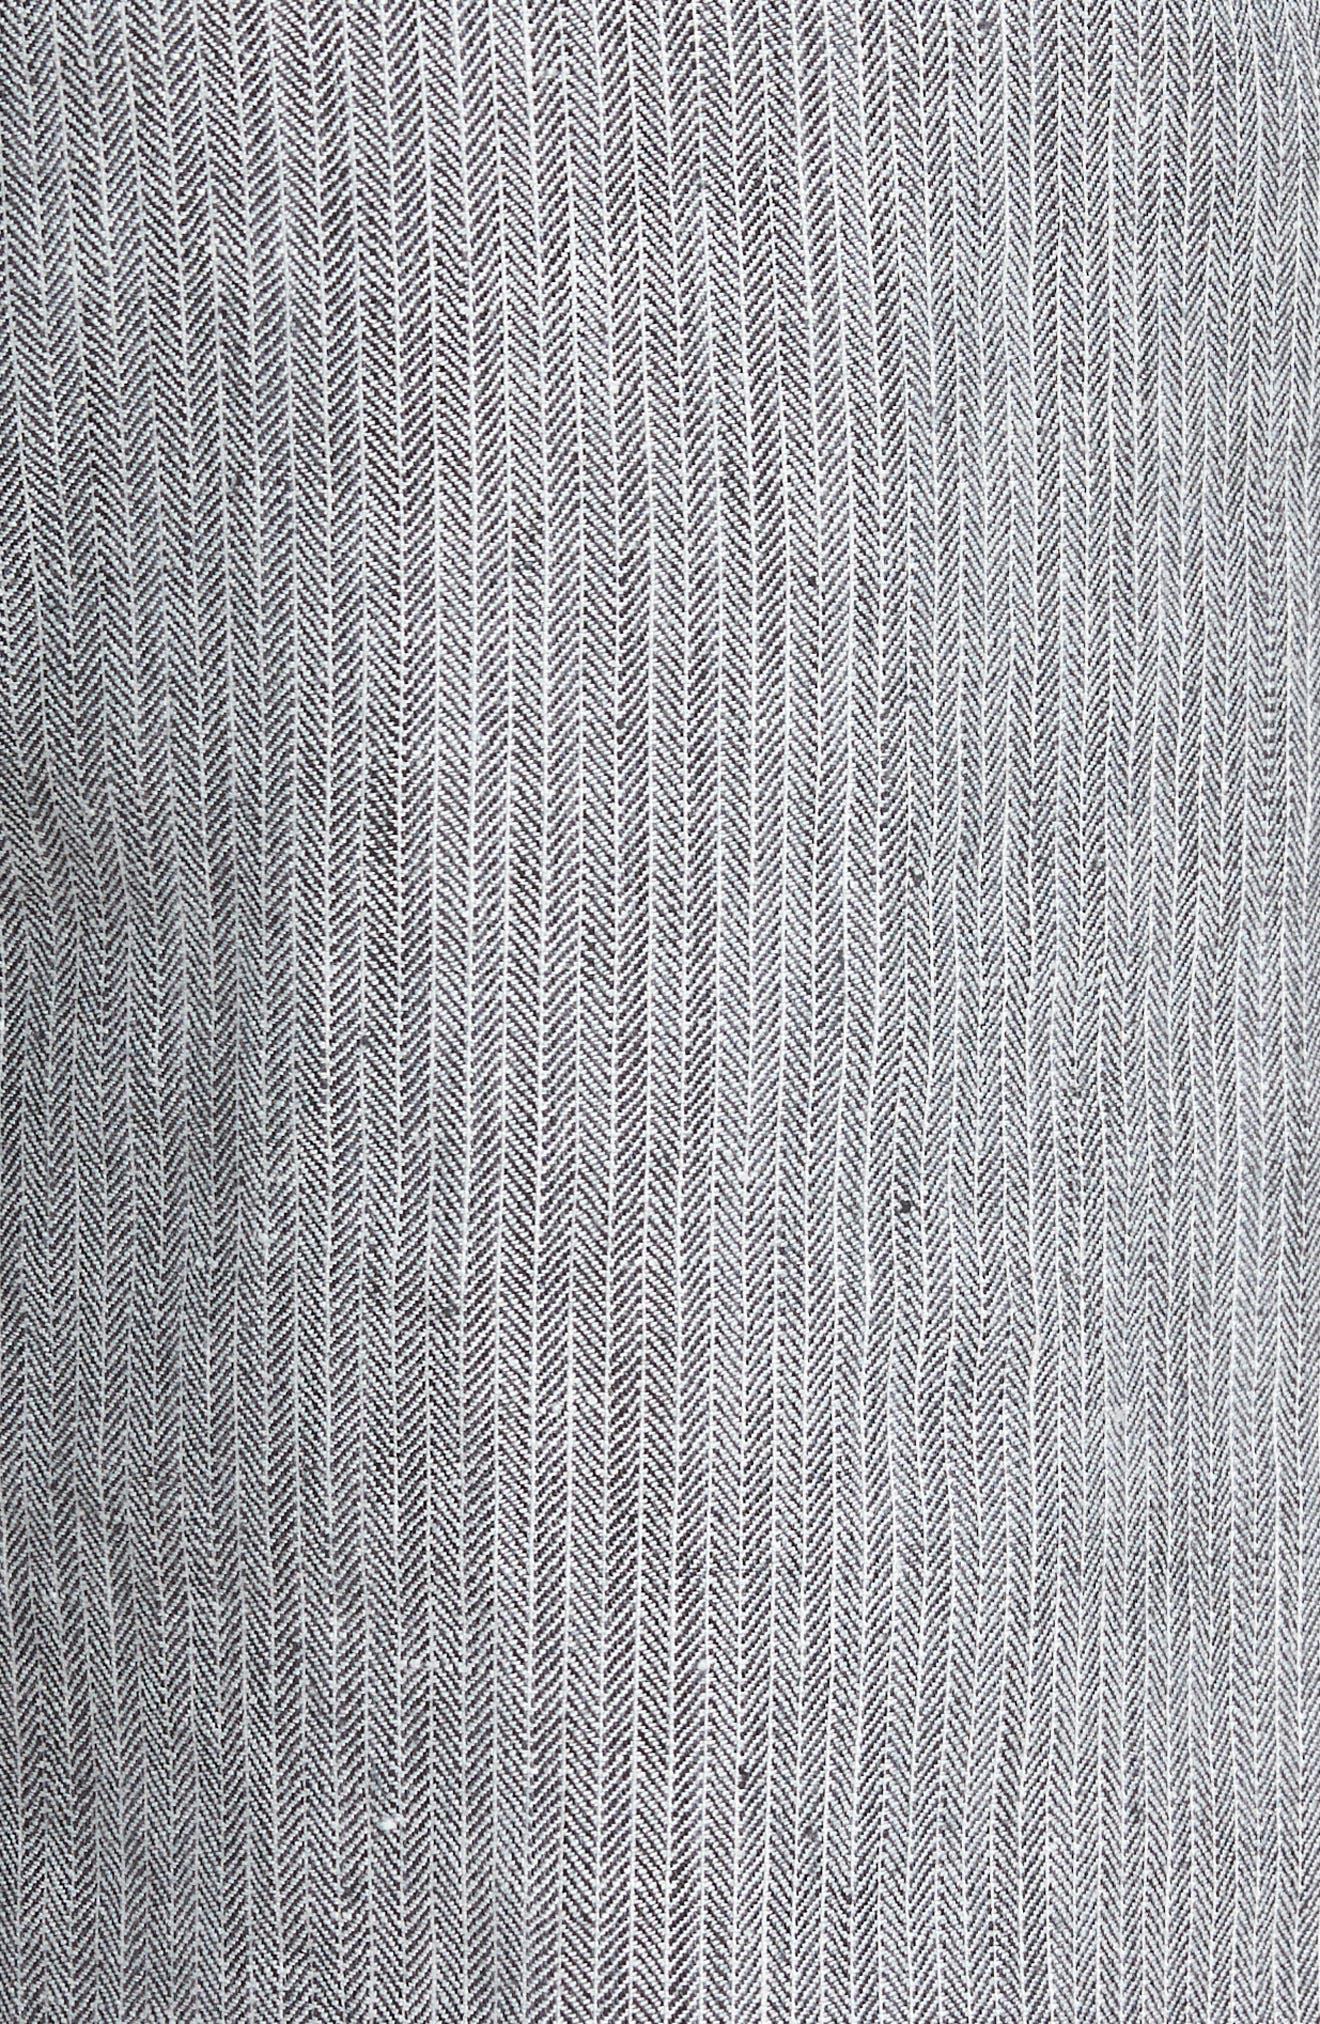 Harbor Herringbone Linen Blend Shorts,                             Alternate thumbnail 5, color,                             Black